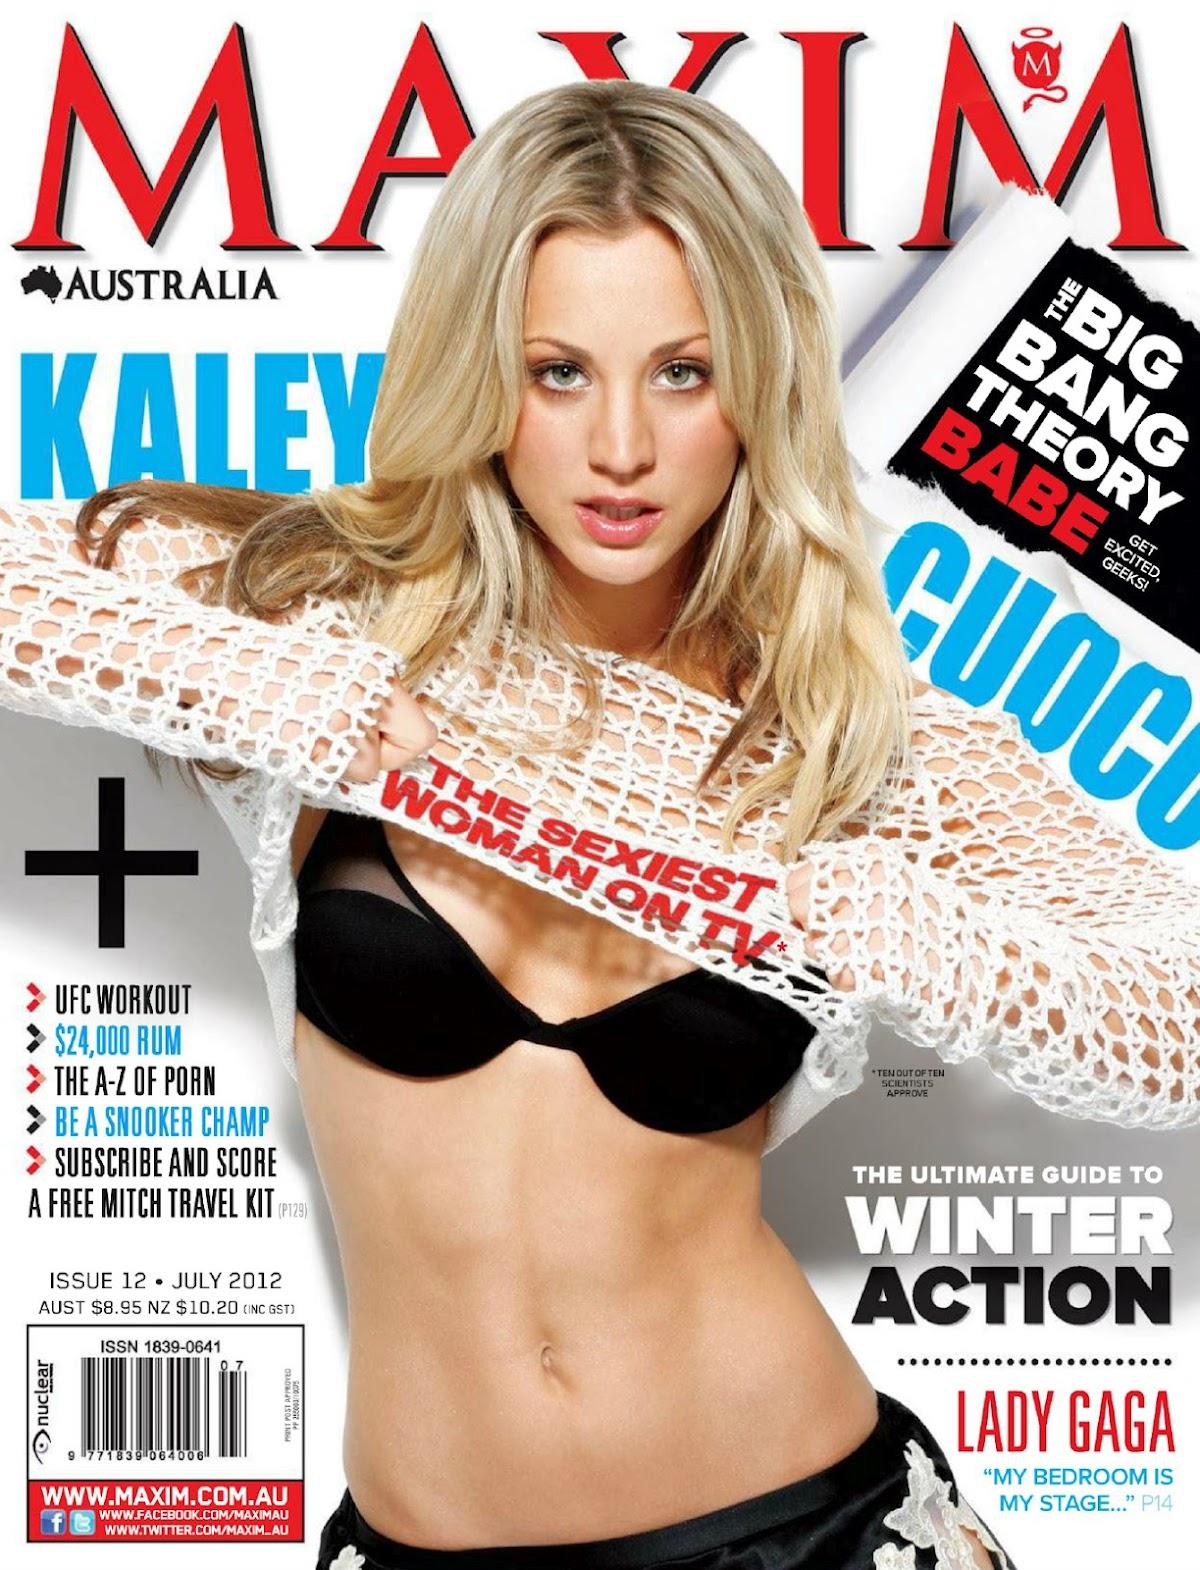 http://1.bp.blogspot.com/-R_XnJ6-aO0g/T-cWvKklySI/AAAAAAAAFFo/DyOSJ8eX3FA/s1570/Kaley+Cuoco+-+Maxim+magazine+Australia+July+2012+01.jpg